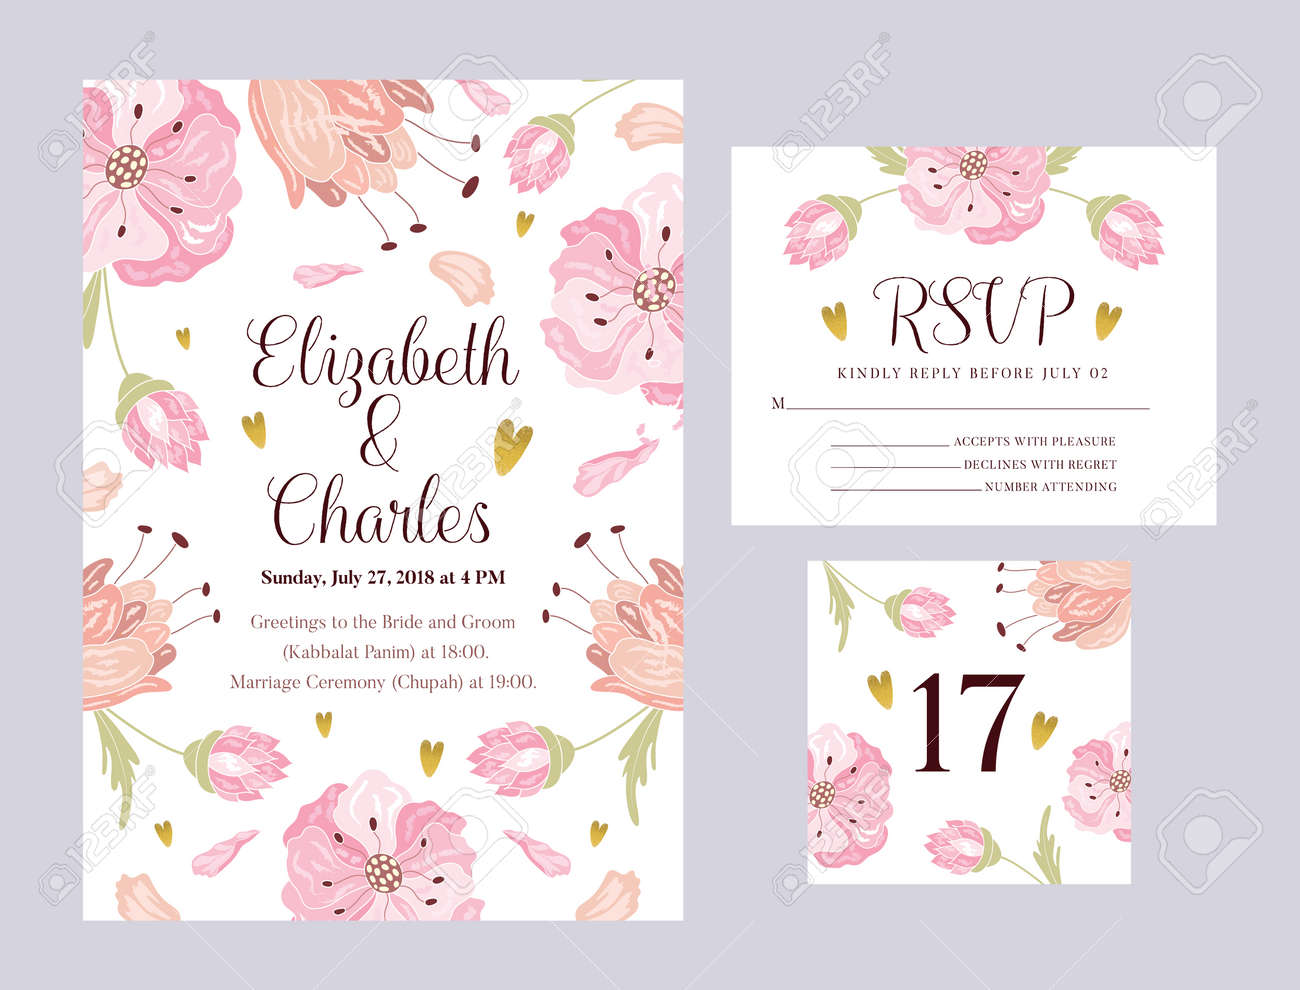 Wedding Invitation Rsvp Card Design With Elegant Flowers Vector